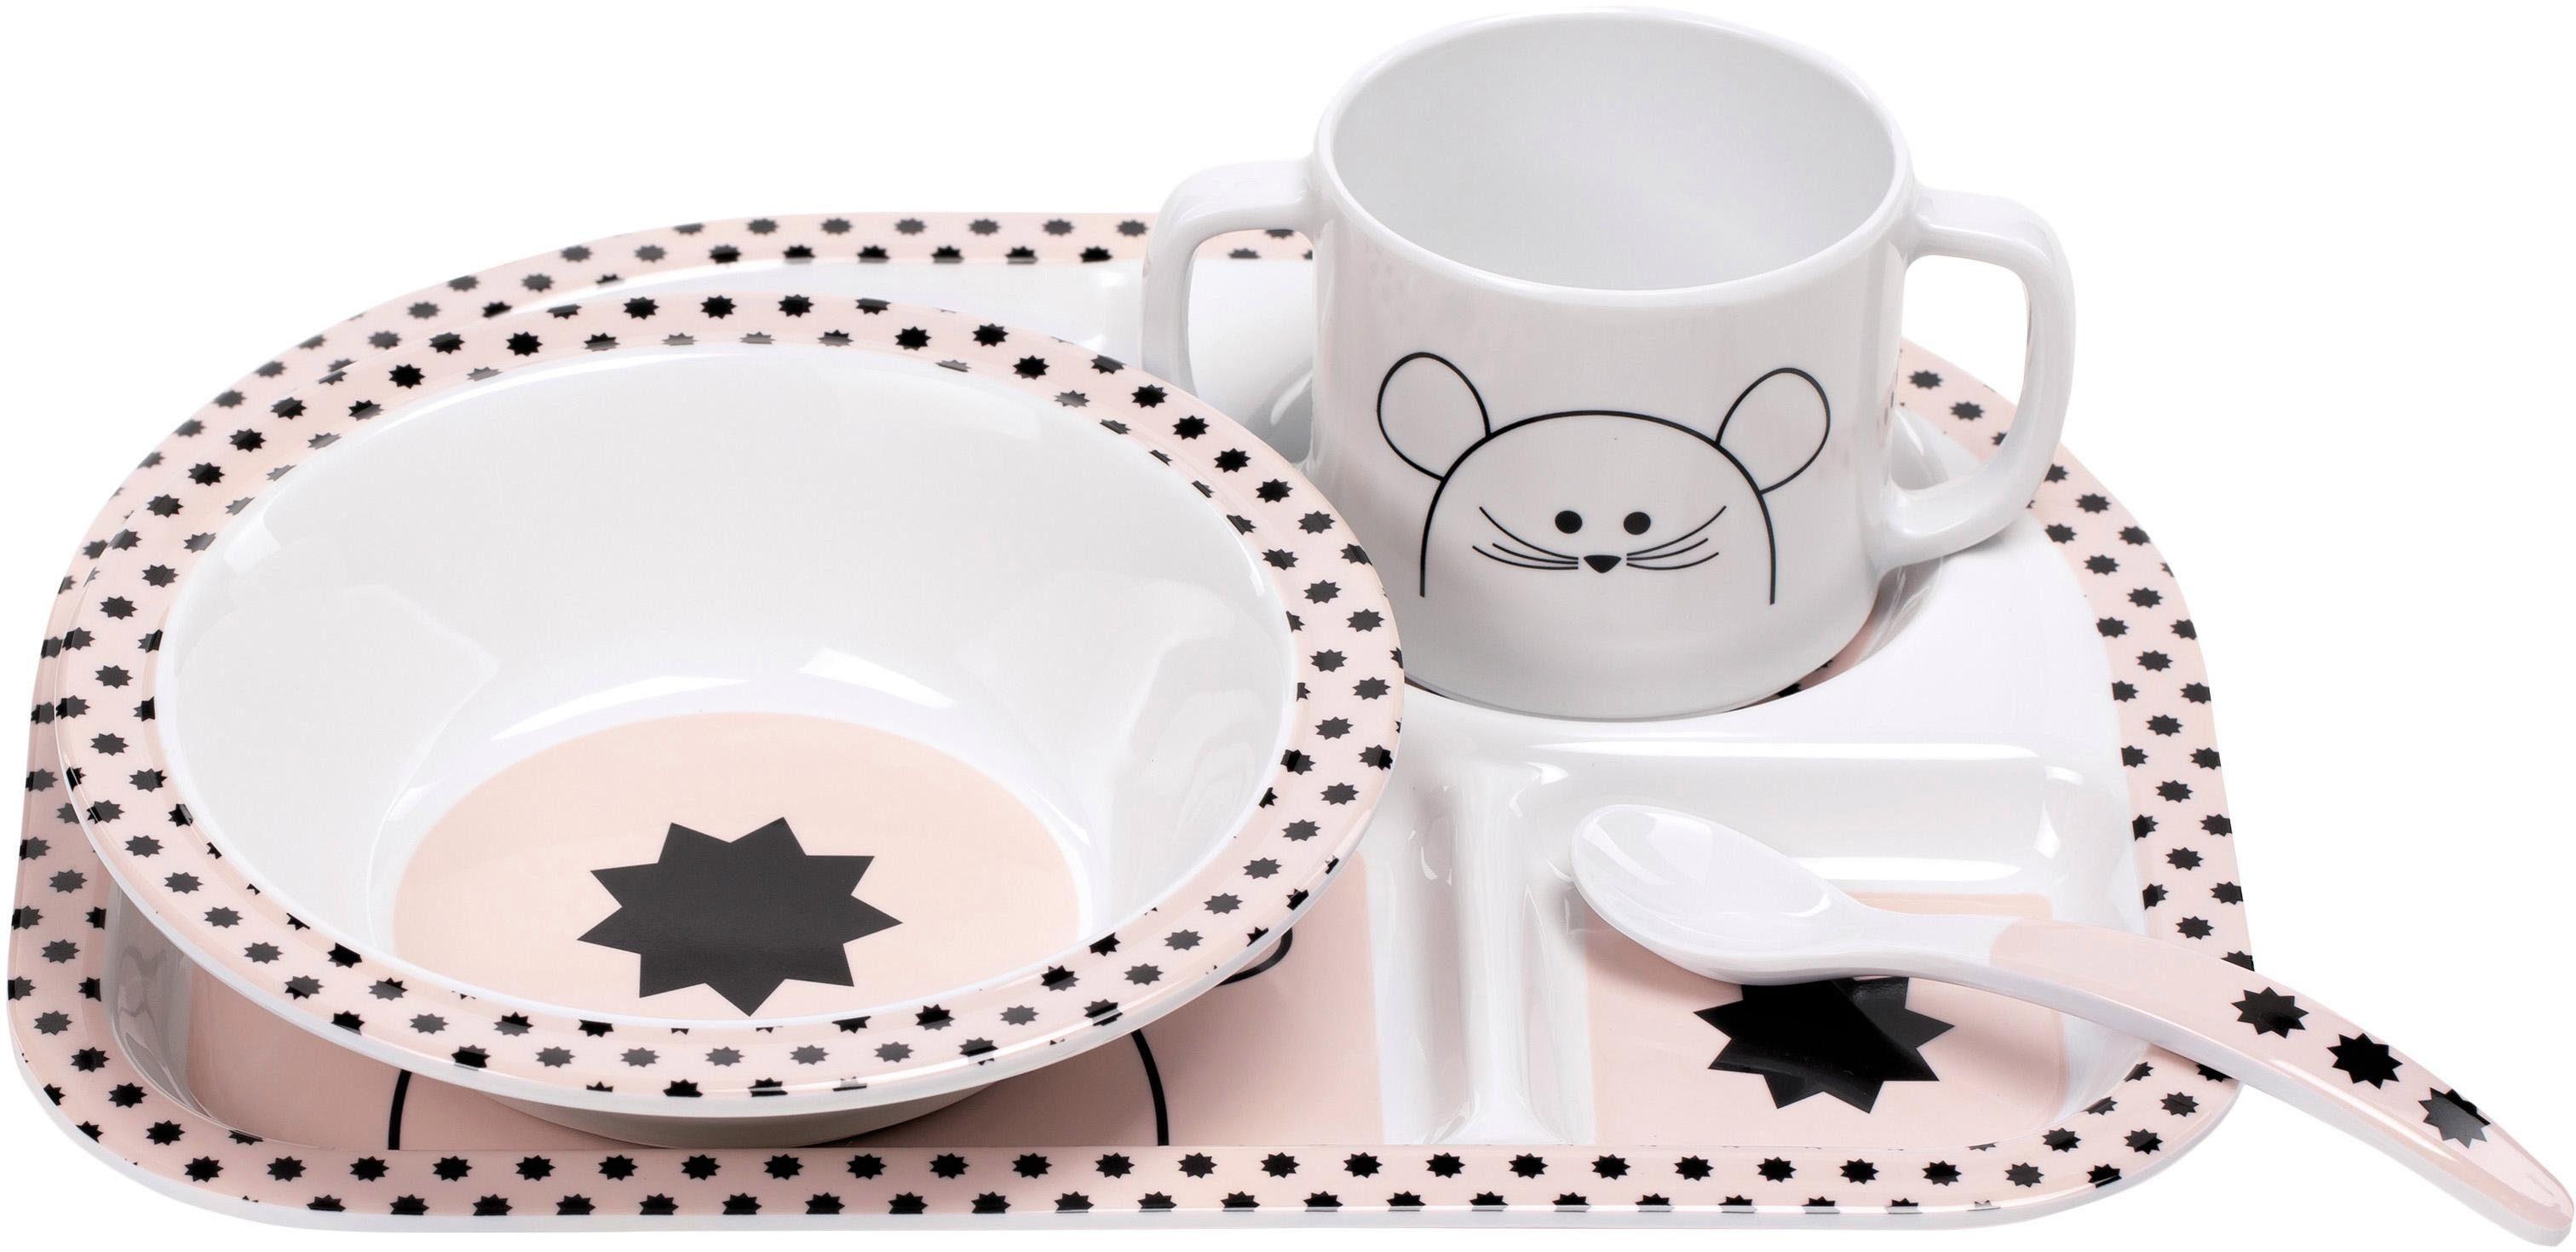 Lässig Kindergeschirr Set, 4-tlg. , »Dish Set, Little Chums Mouse«